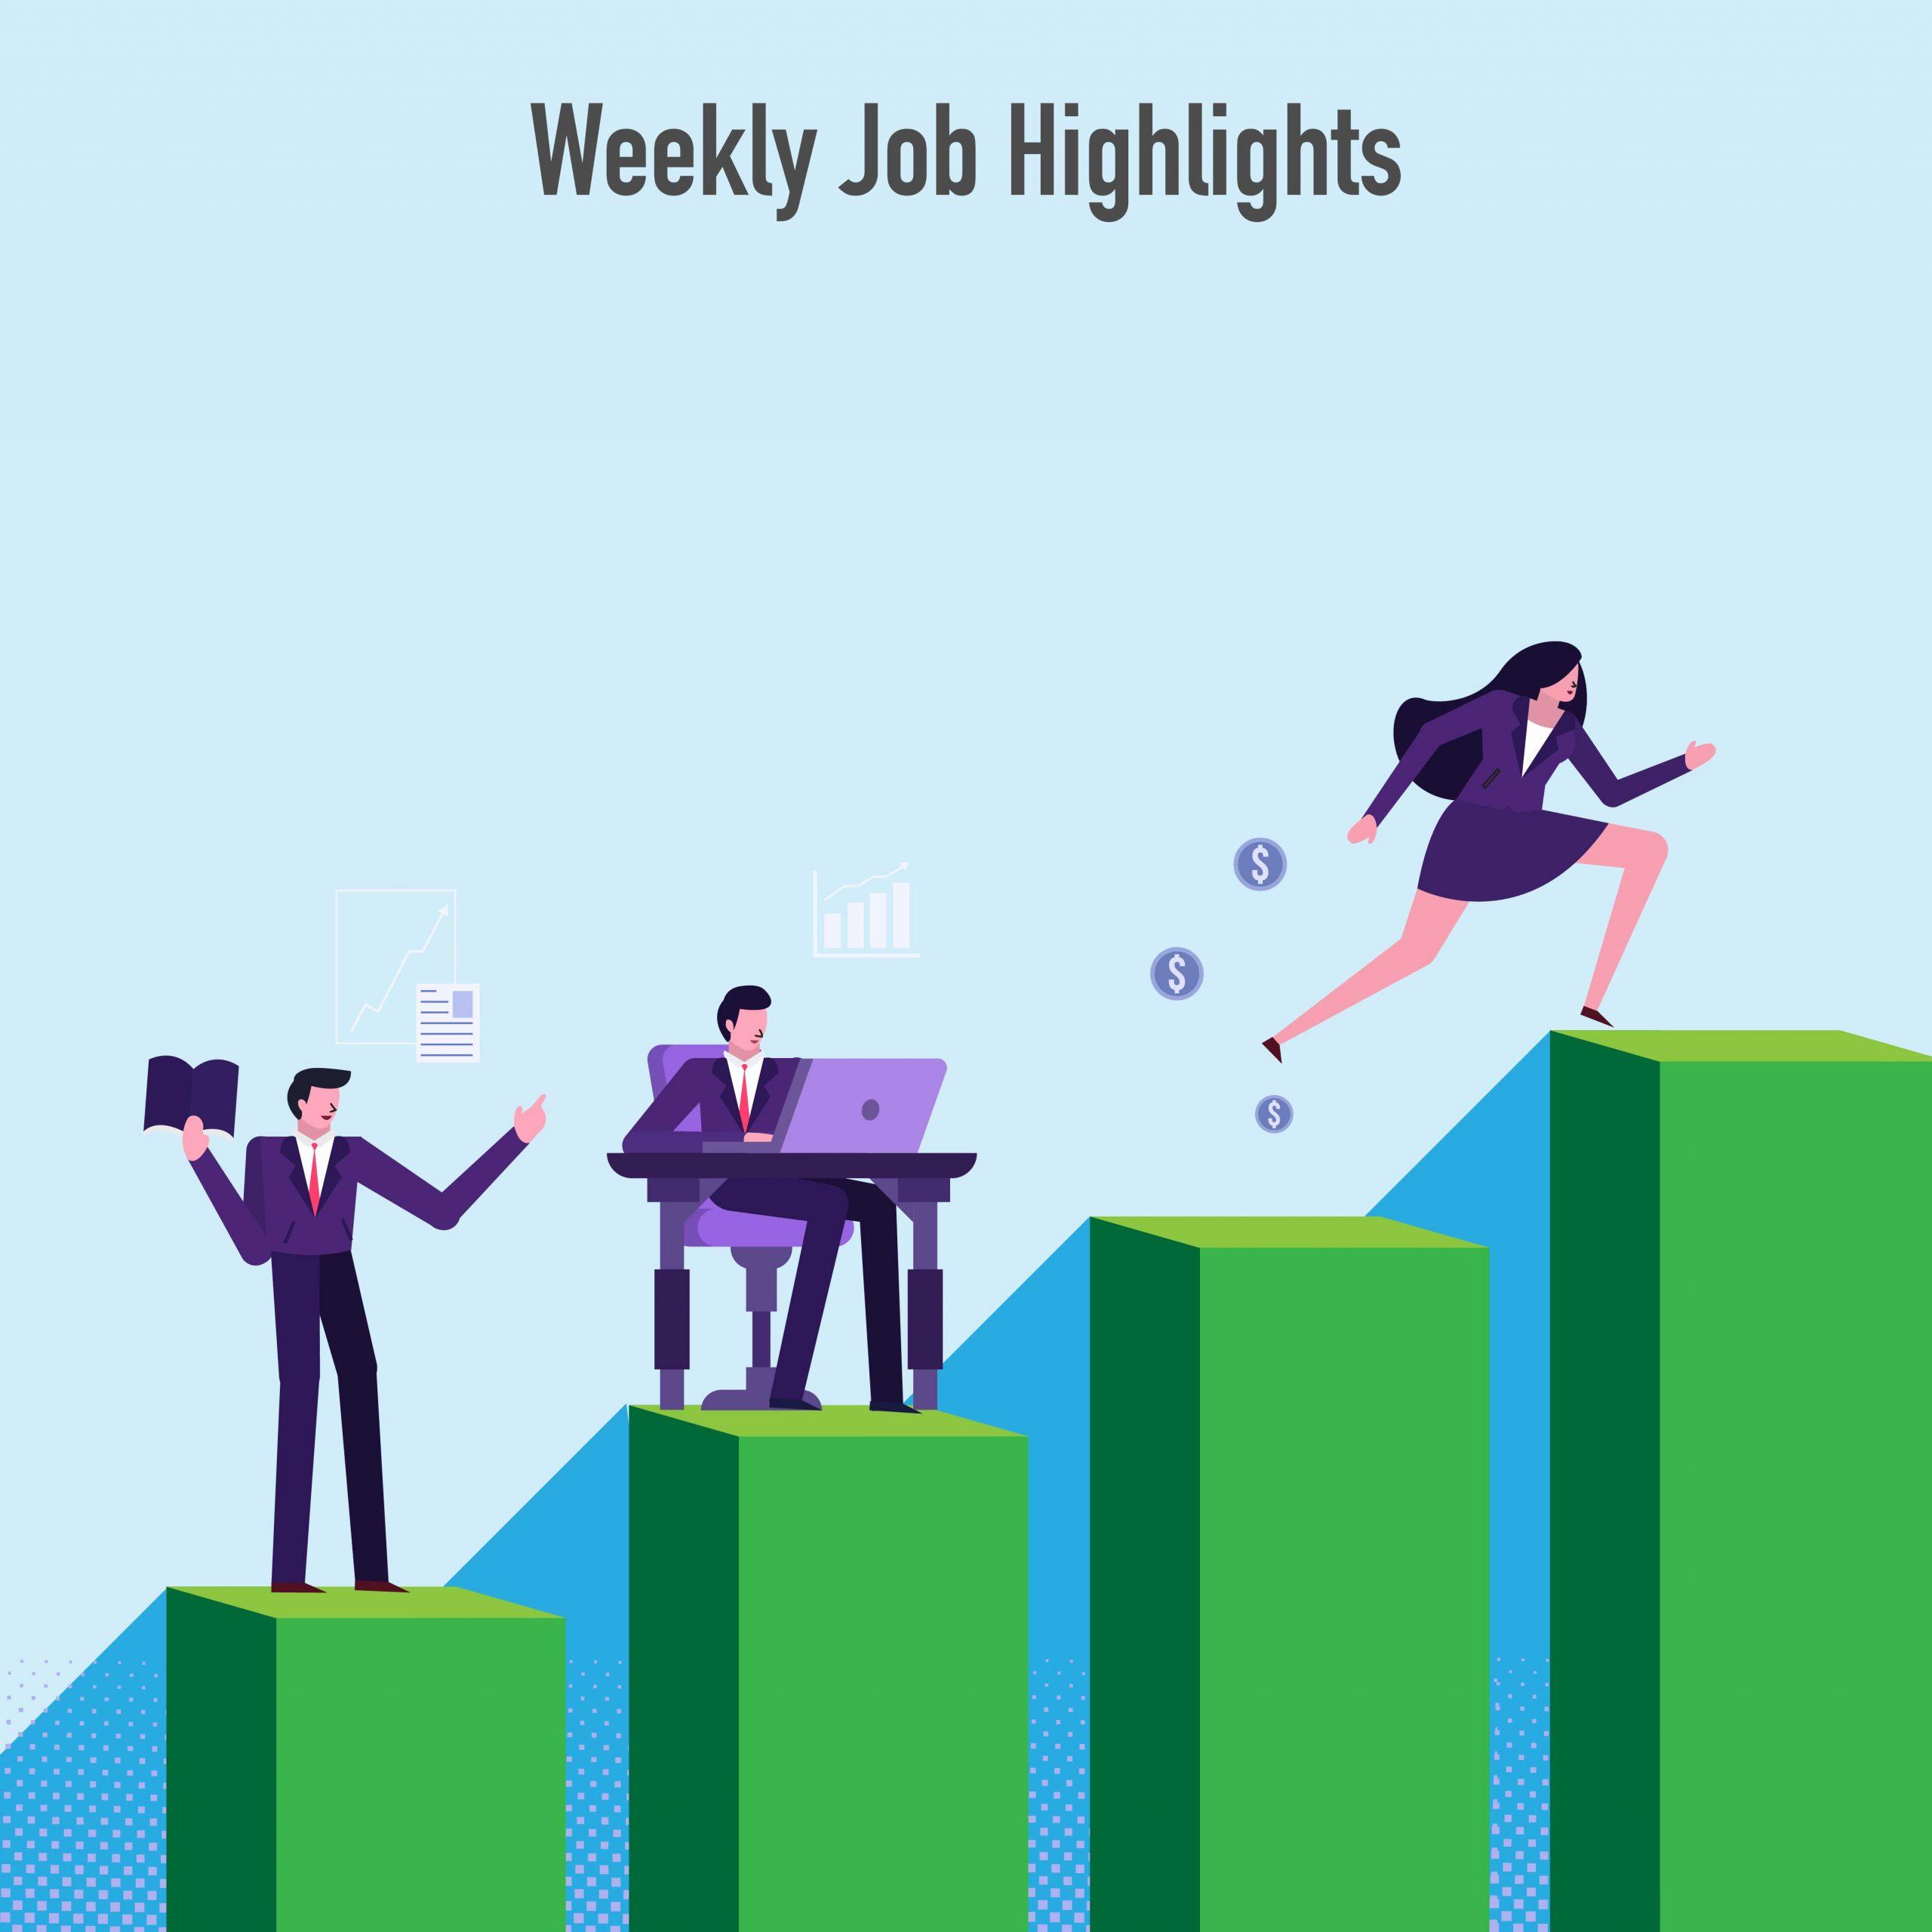 Mānoa Career Center | May 7, 2021 | <b>Job Highlights</b>